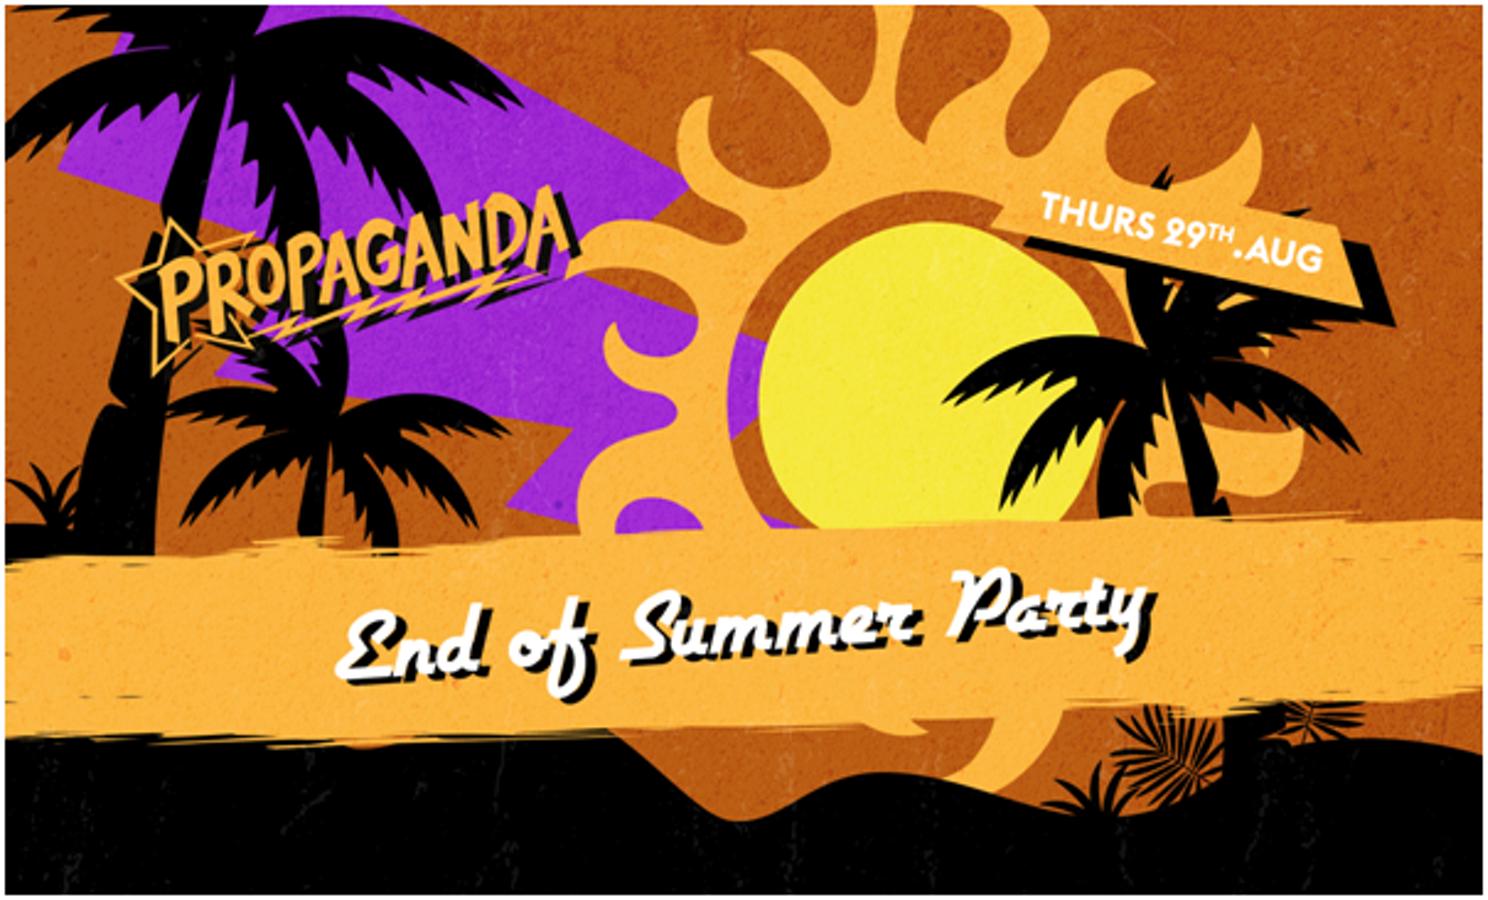 Propaganda Cheltenham – End of Summer Party